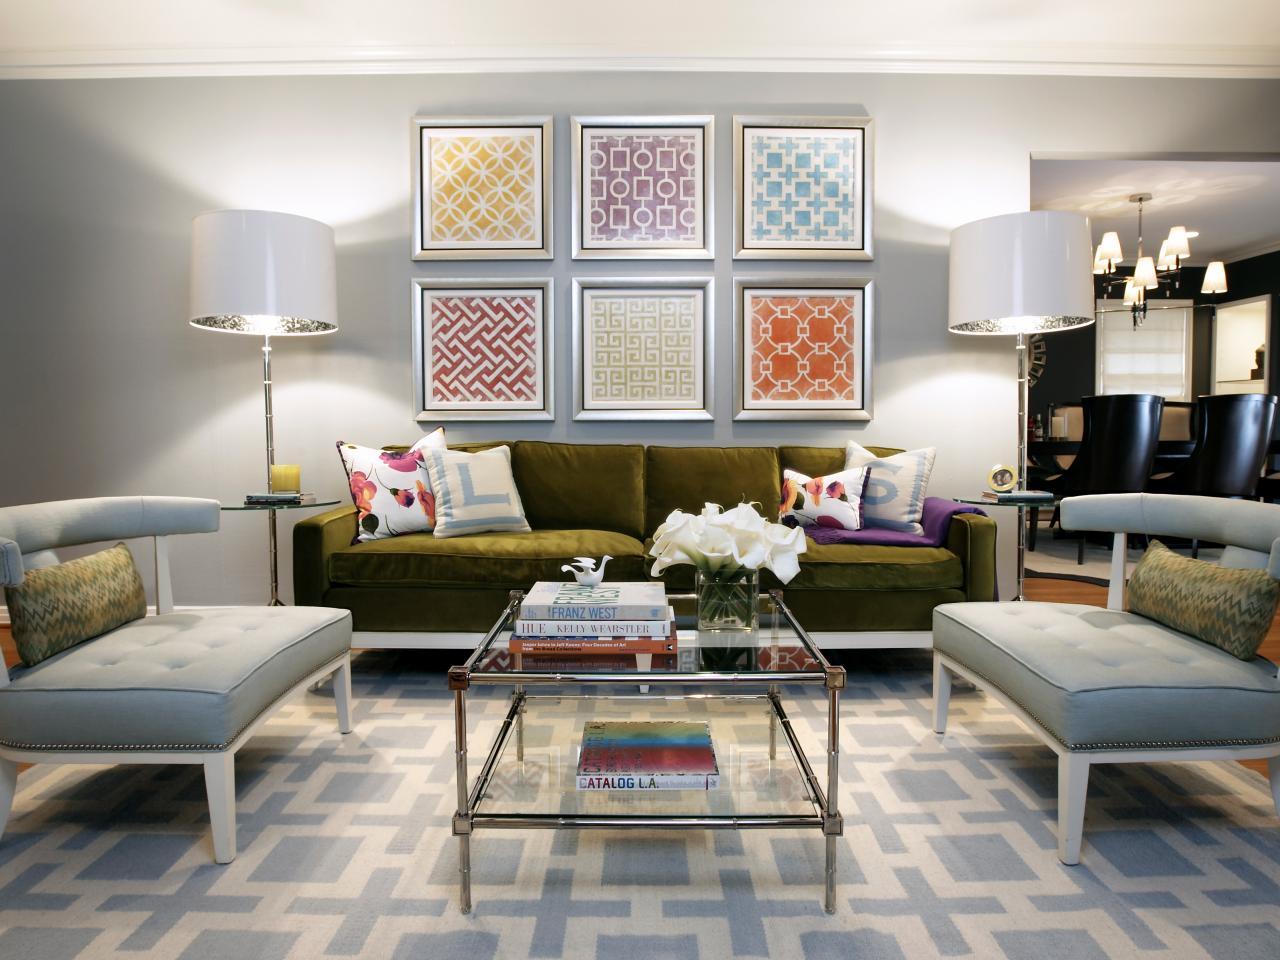 colorful-modern-living-room-multi-color-patterned-art-display-hgtv.jpg